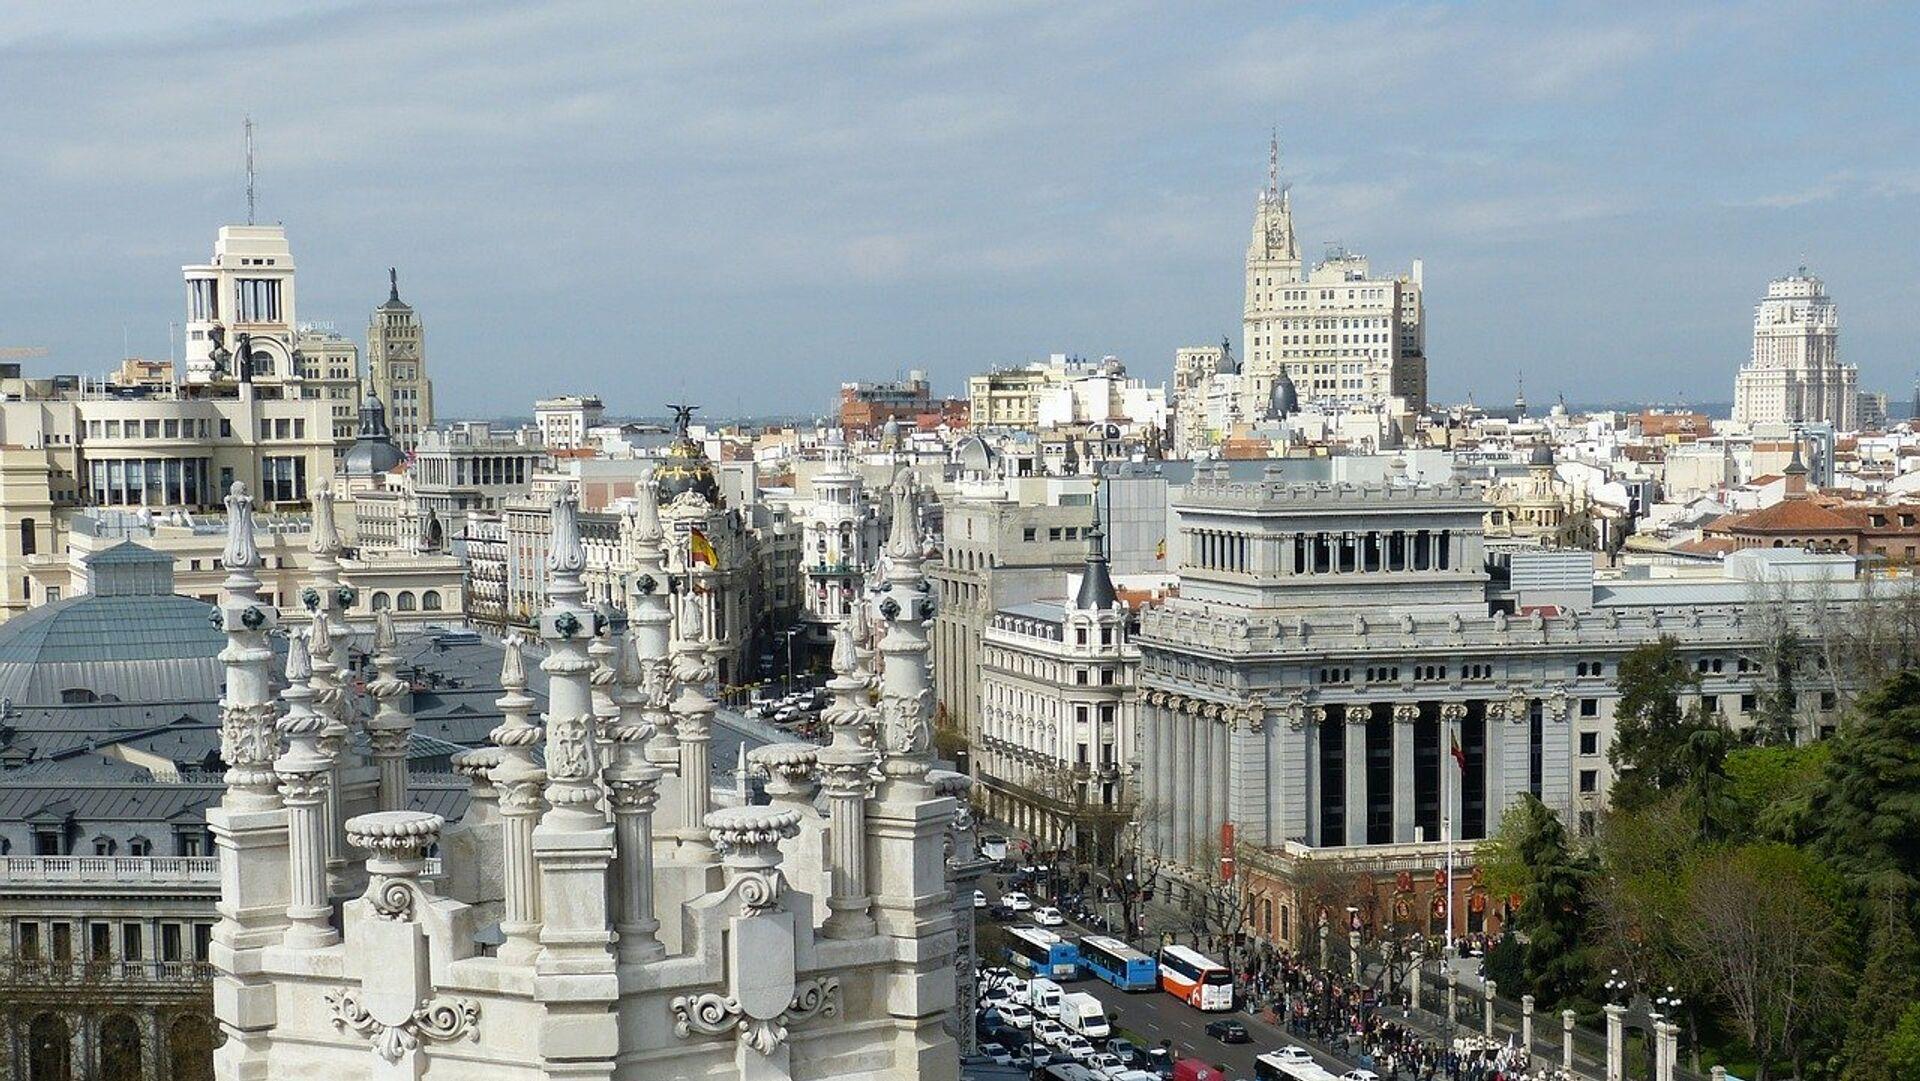 El centro de Madrid, referencial - Sputnik Mundo, 1920, 29.04.2021